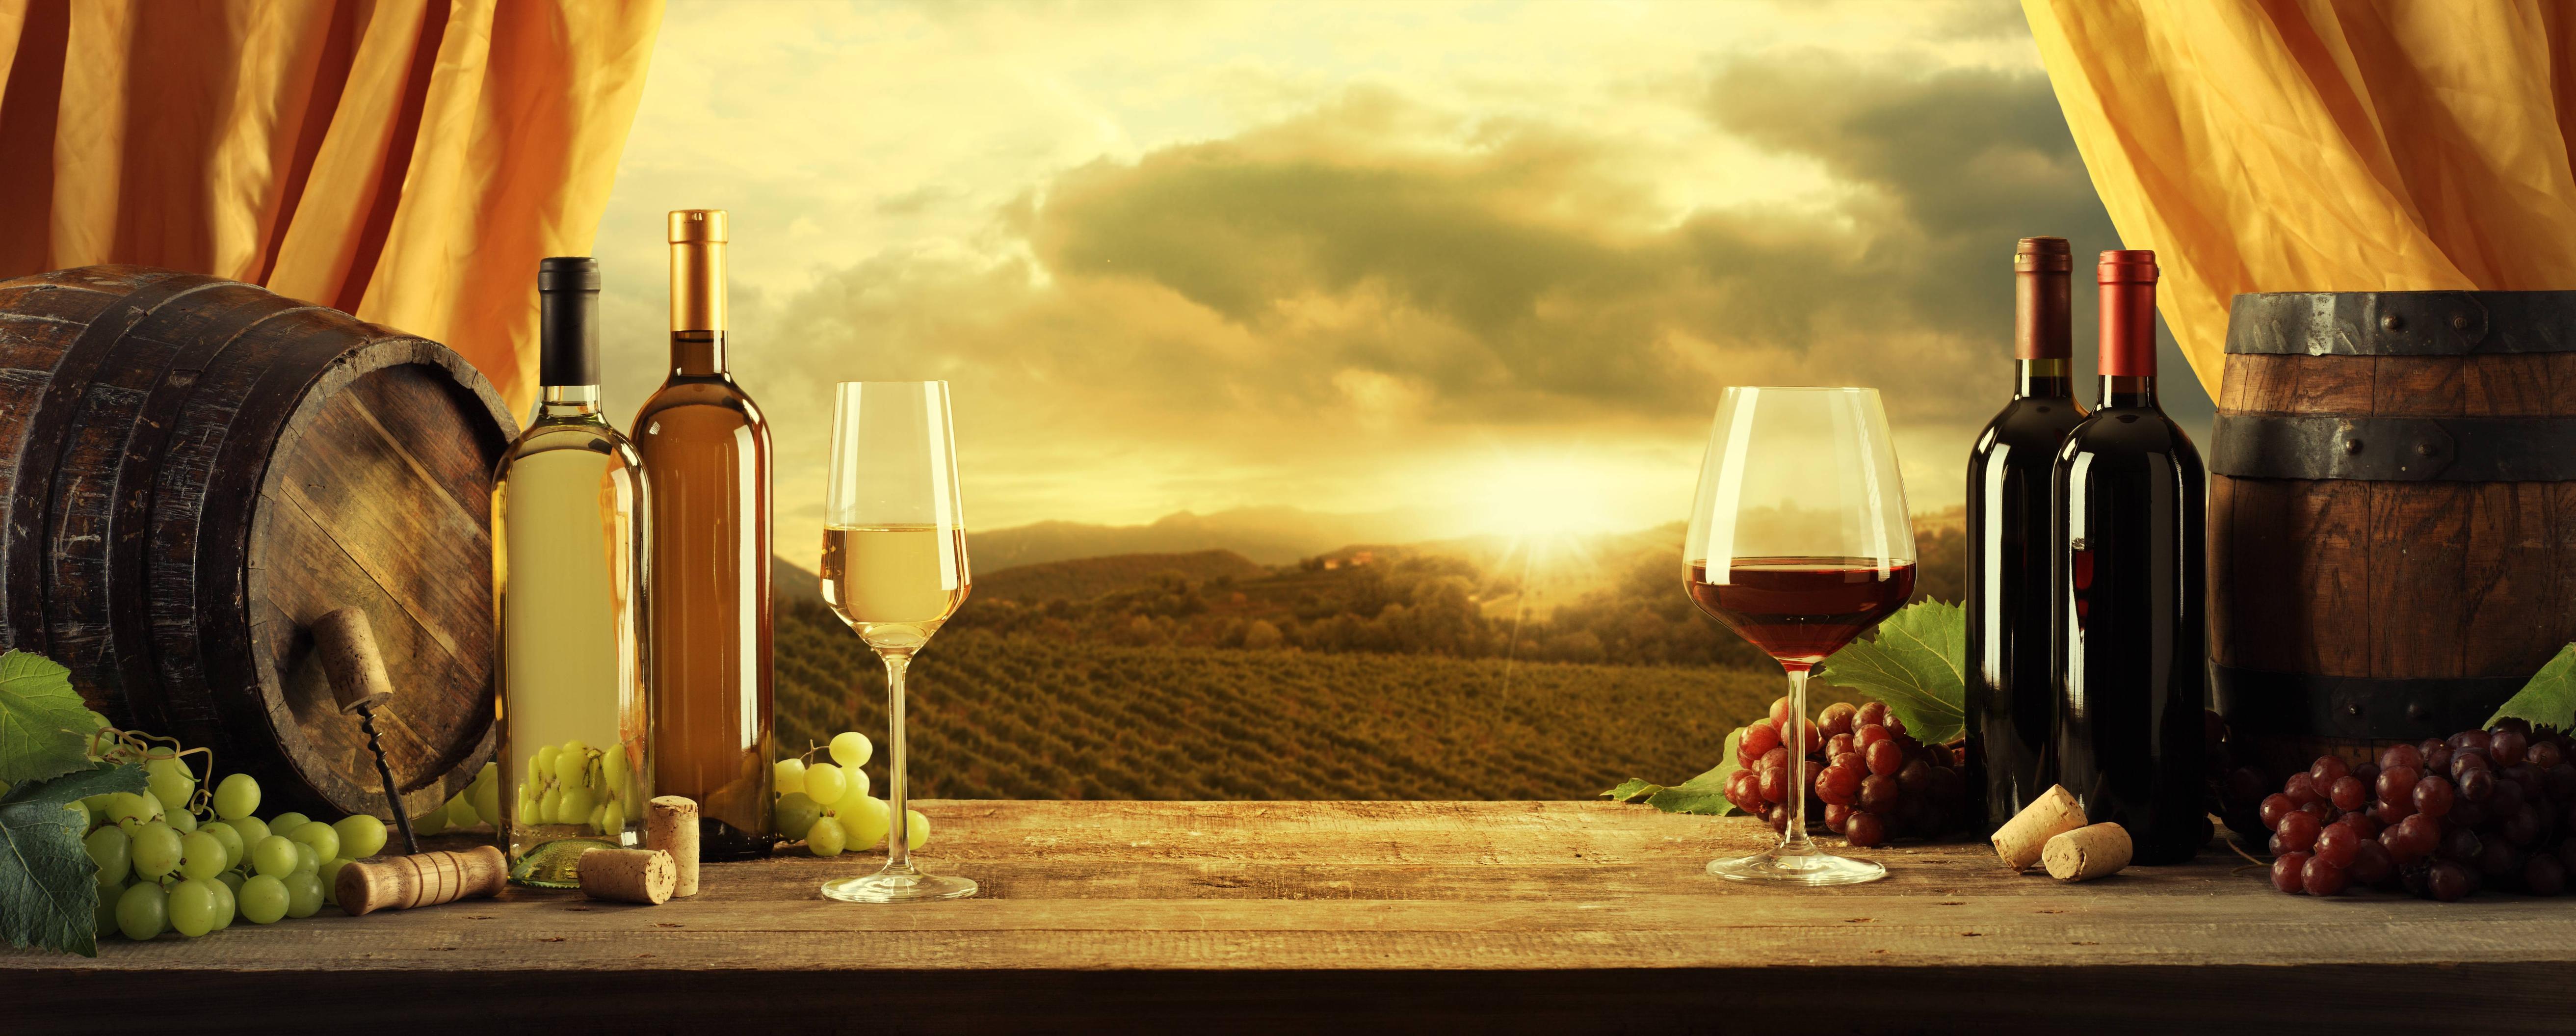 vino wallpapers wallpaper cave